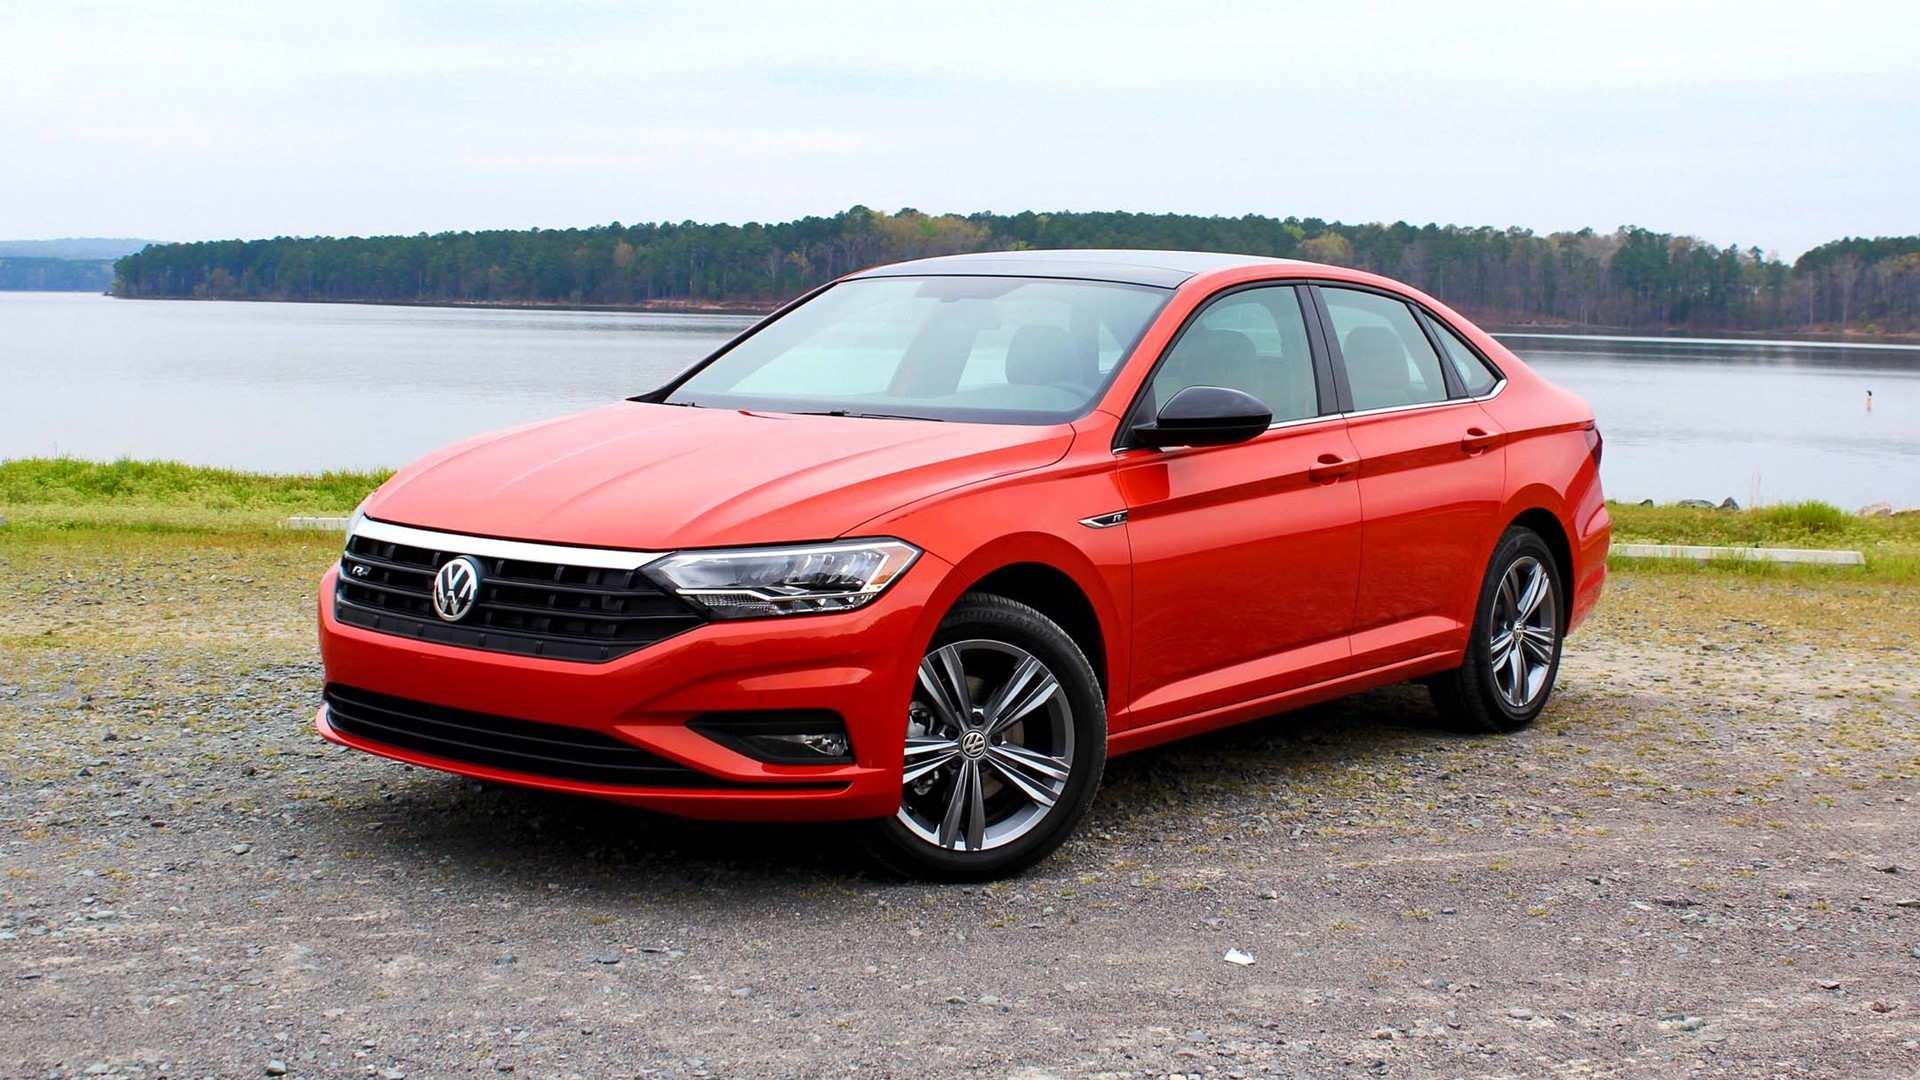 43 Gallery of The Volkswagen Jetta 2019 Fuel Economy Engine Ratings by The Volkswagen Jetta 2019 Fuel Economy Engine